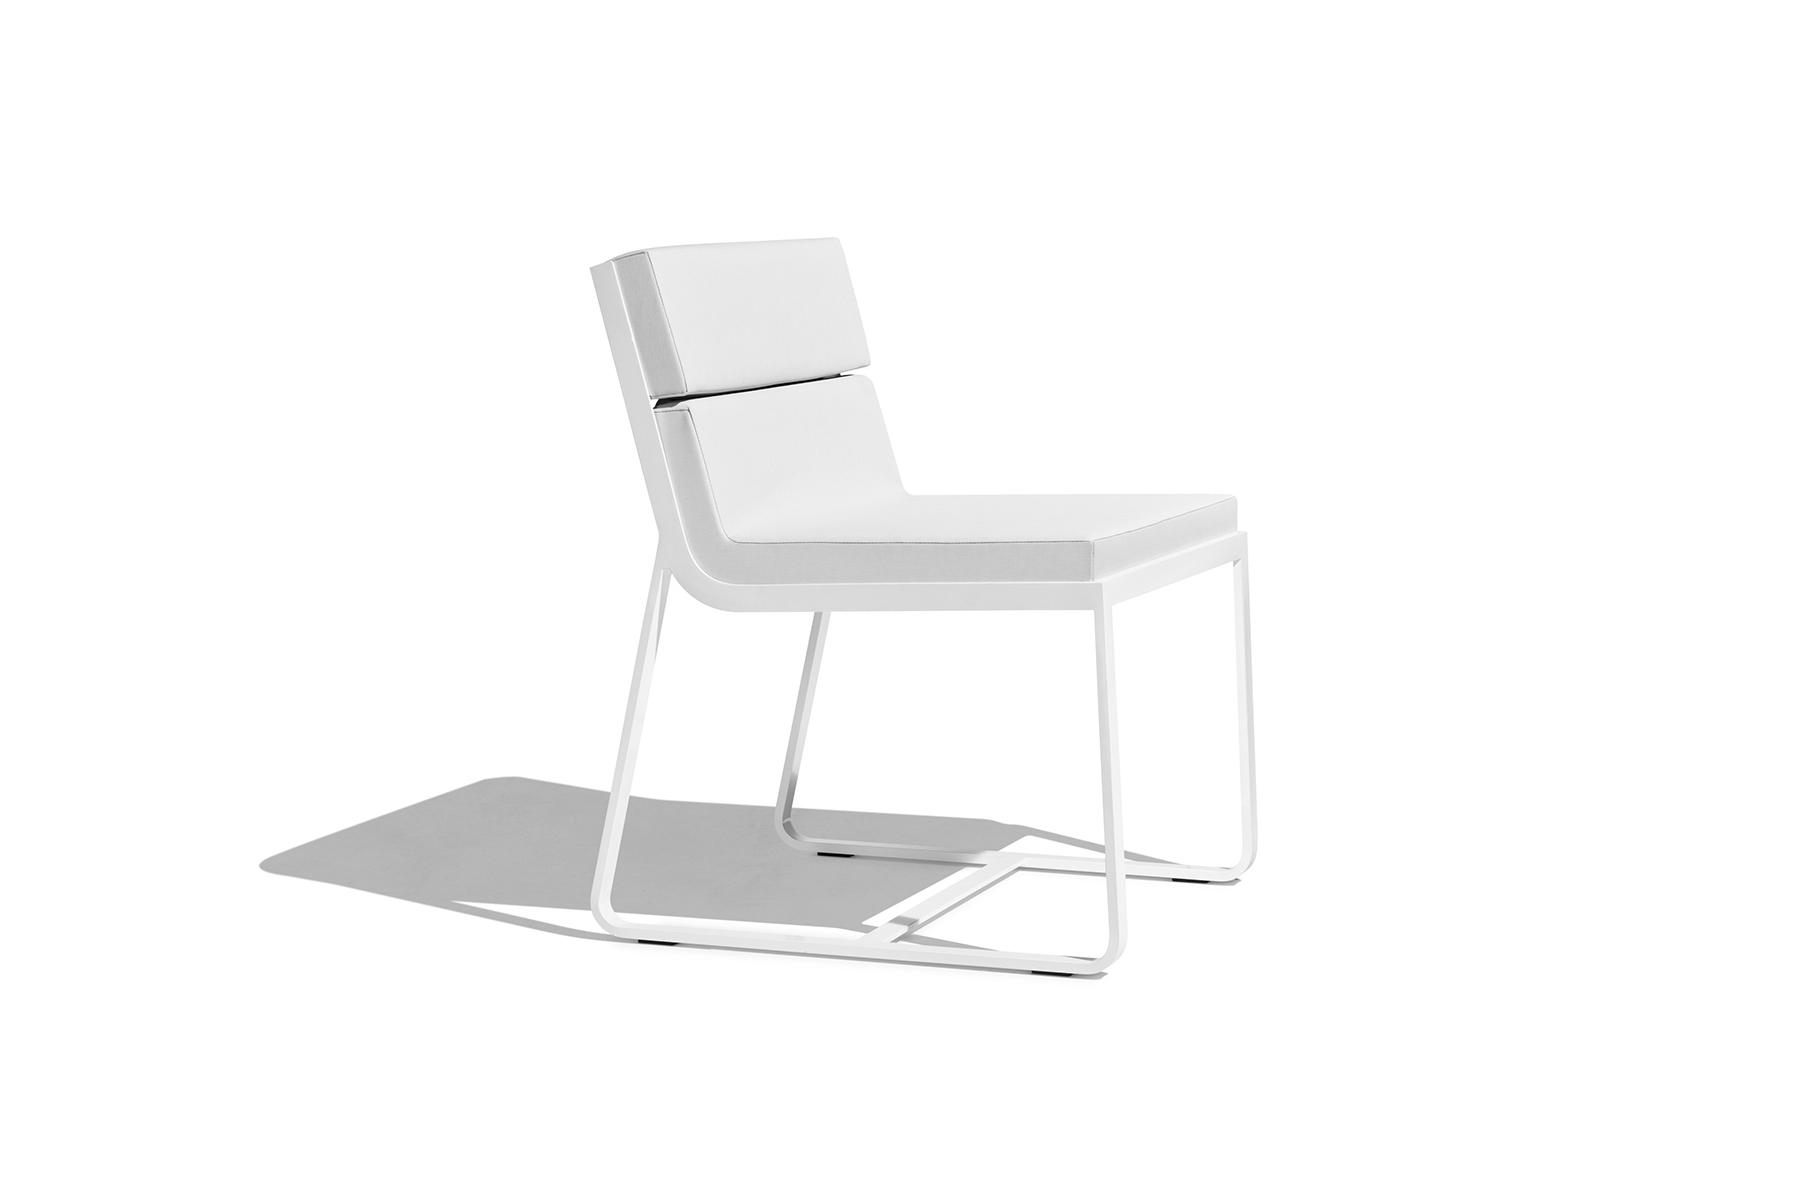 sit_chair